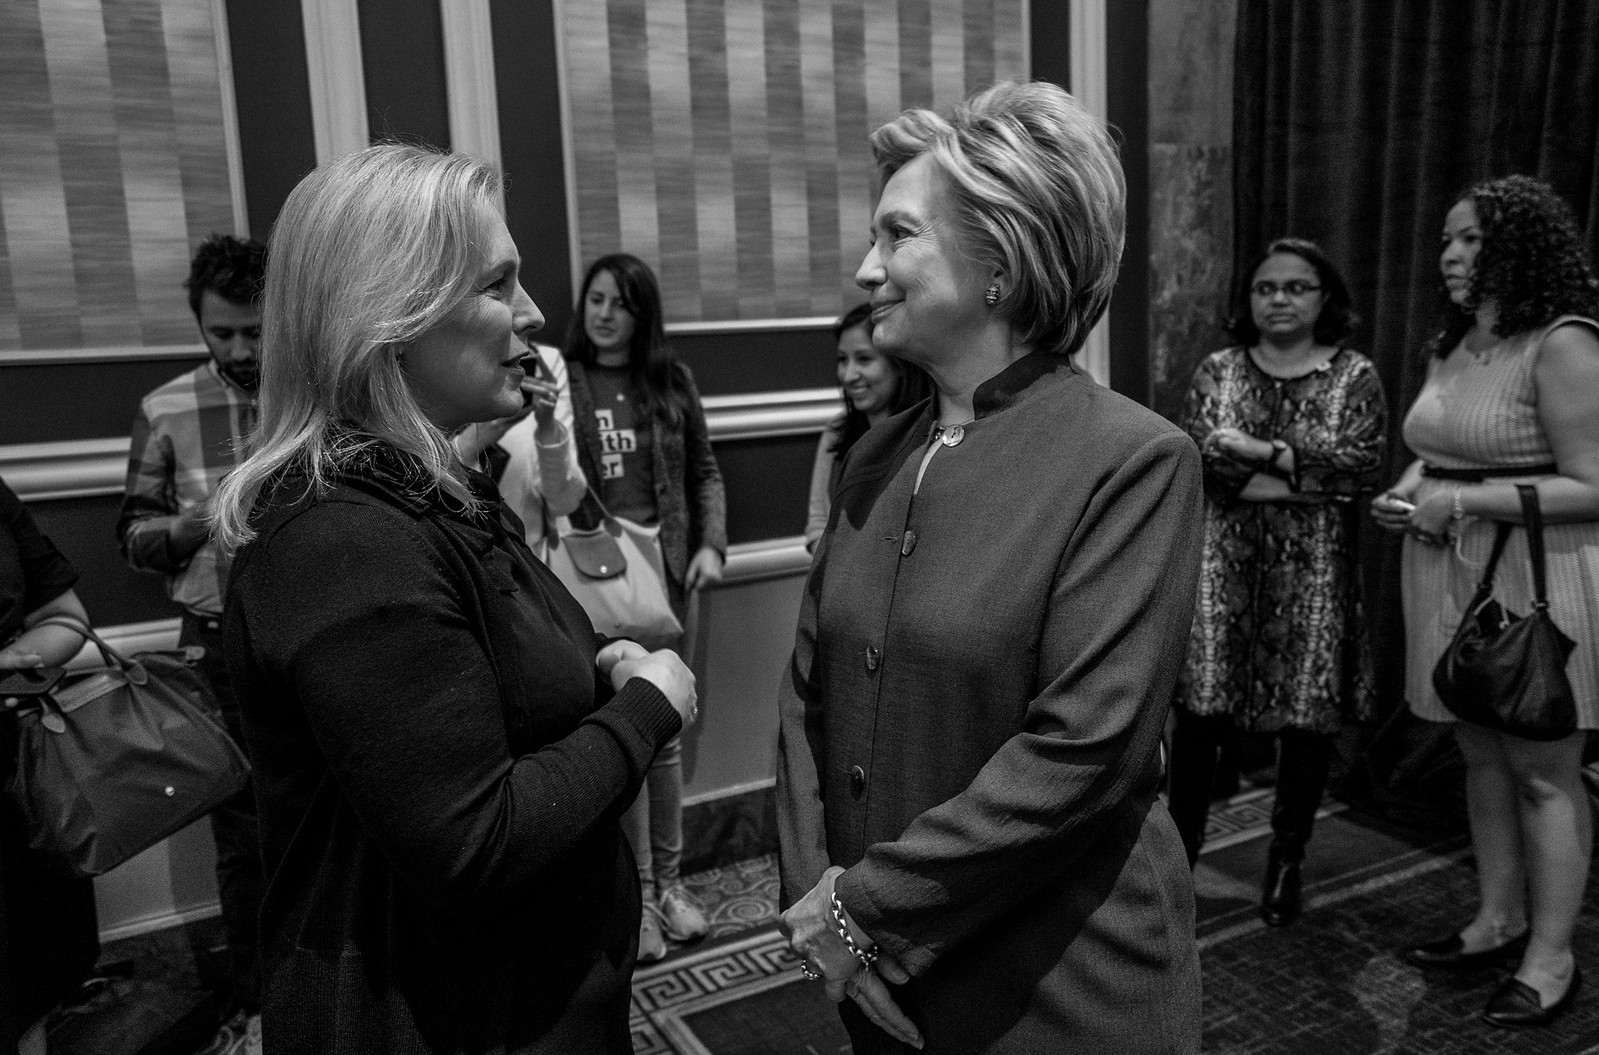 April 18, 2016 - New York, New York | by Hillary Clinton